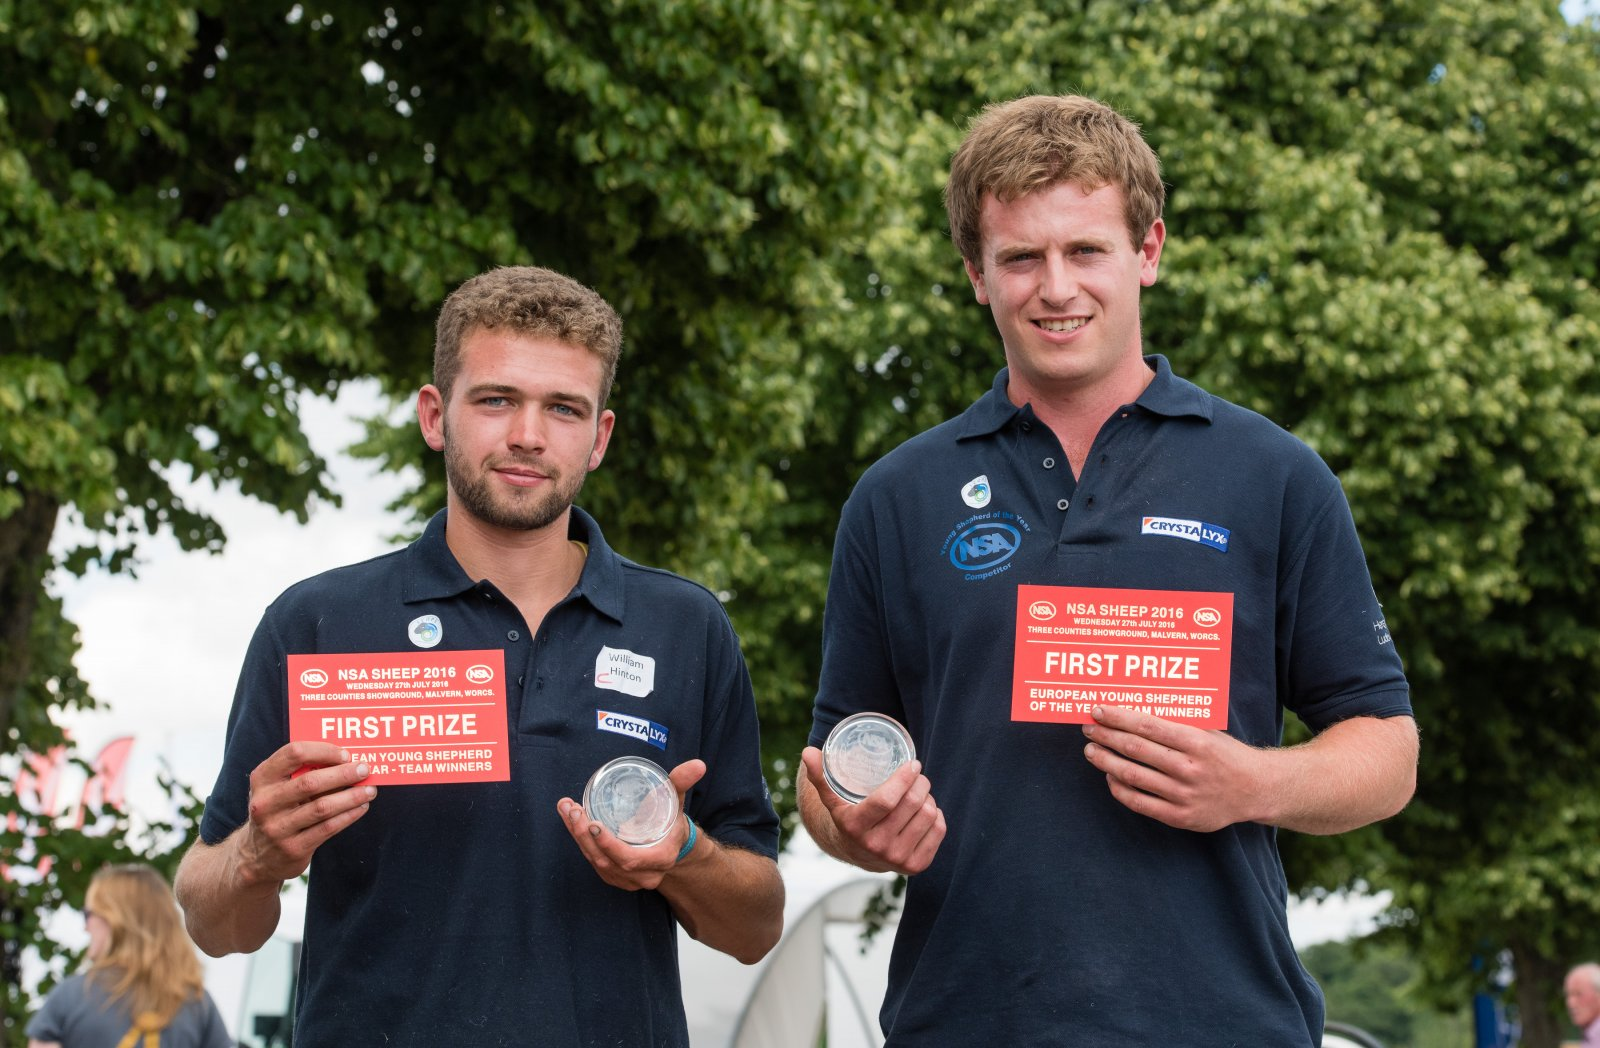 Young European Shepherd Winner Will Hinton (left) and Richard Carter